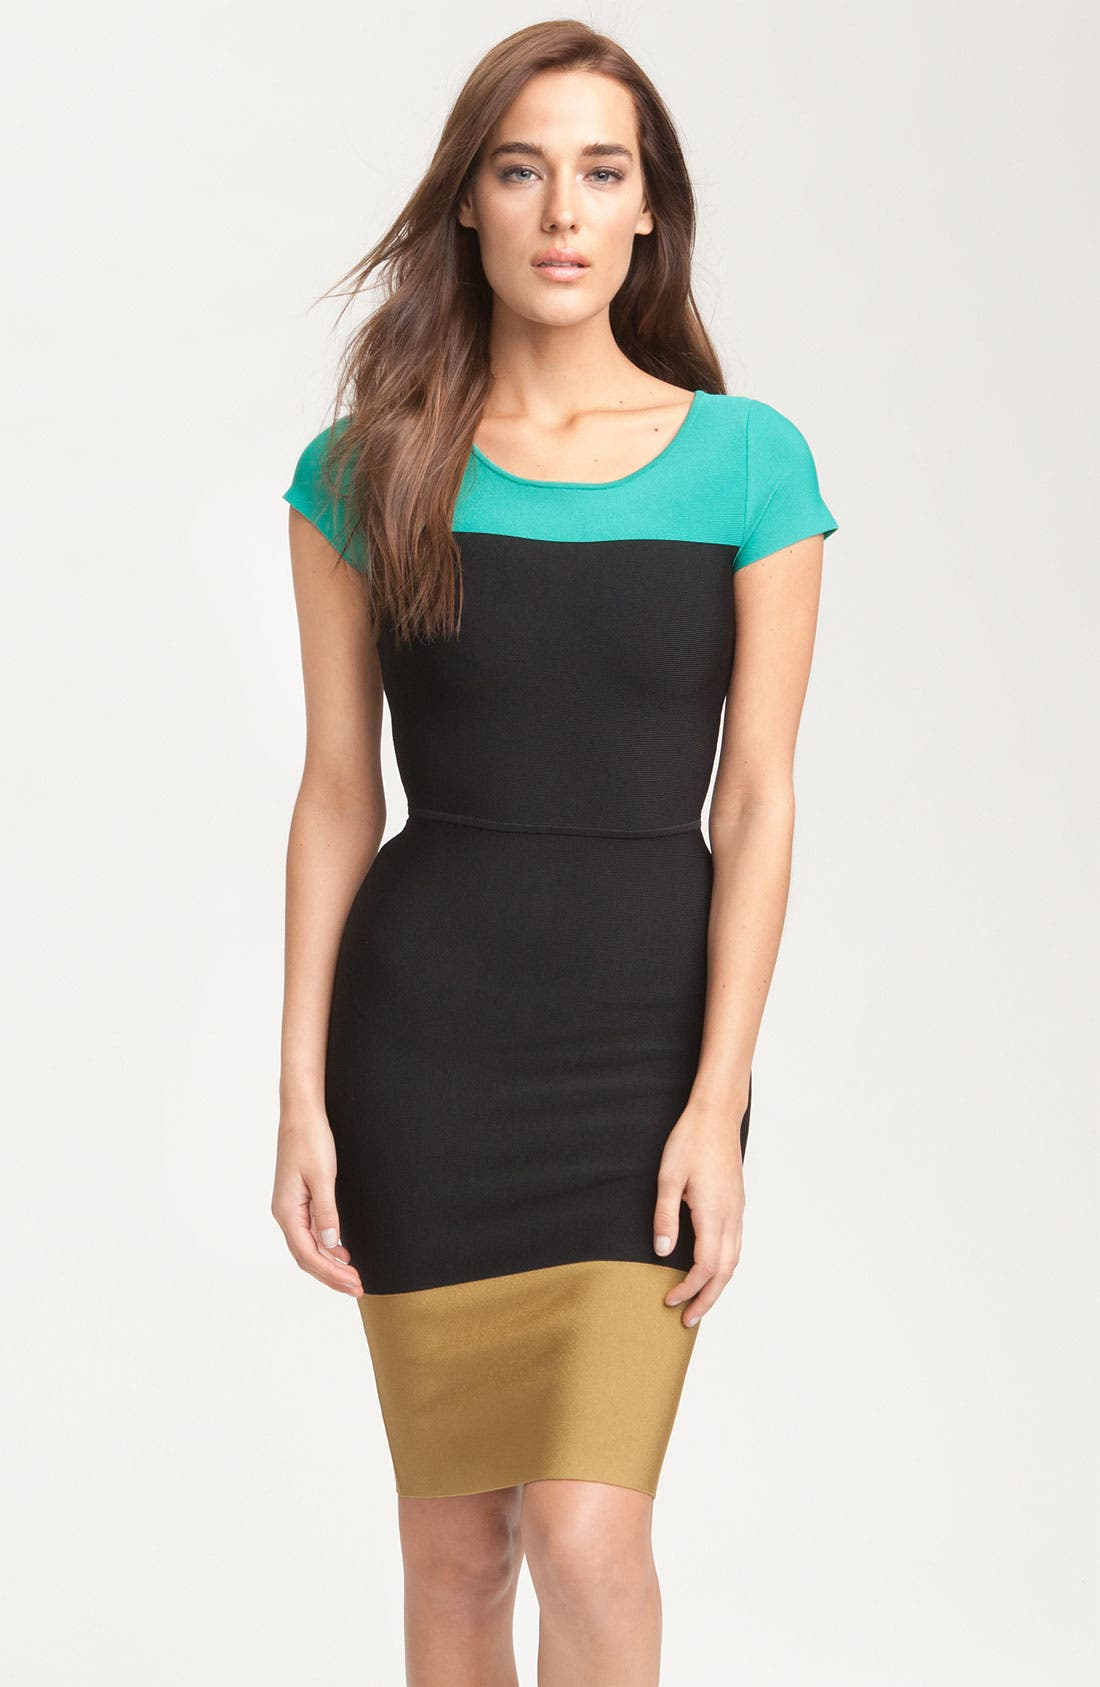 Alternate Image 1 Selected - BCBGMAXAZRIA Colorblock Knit Dress